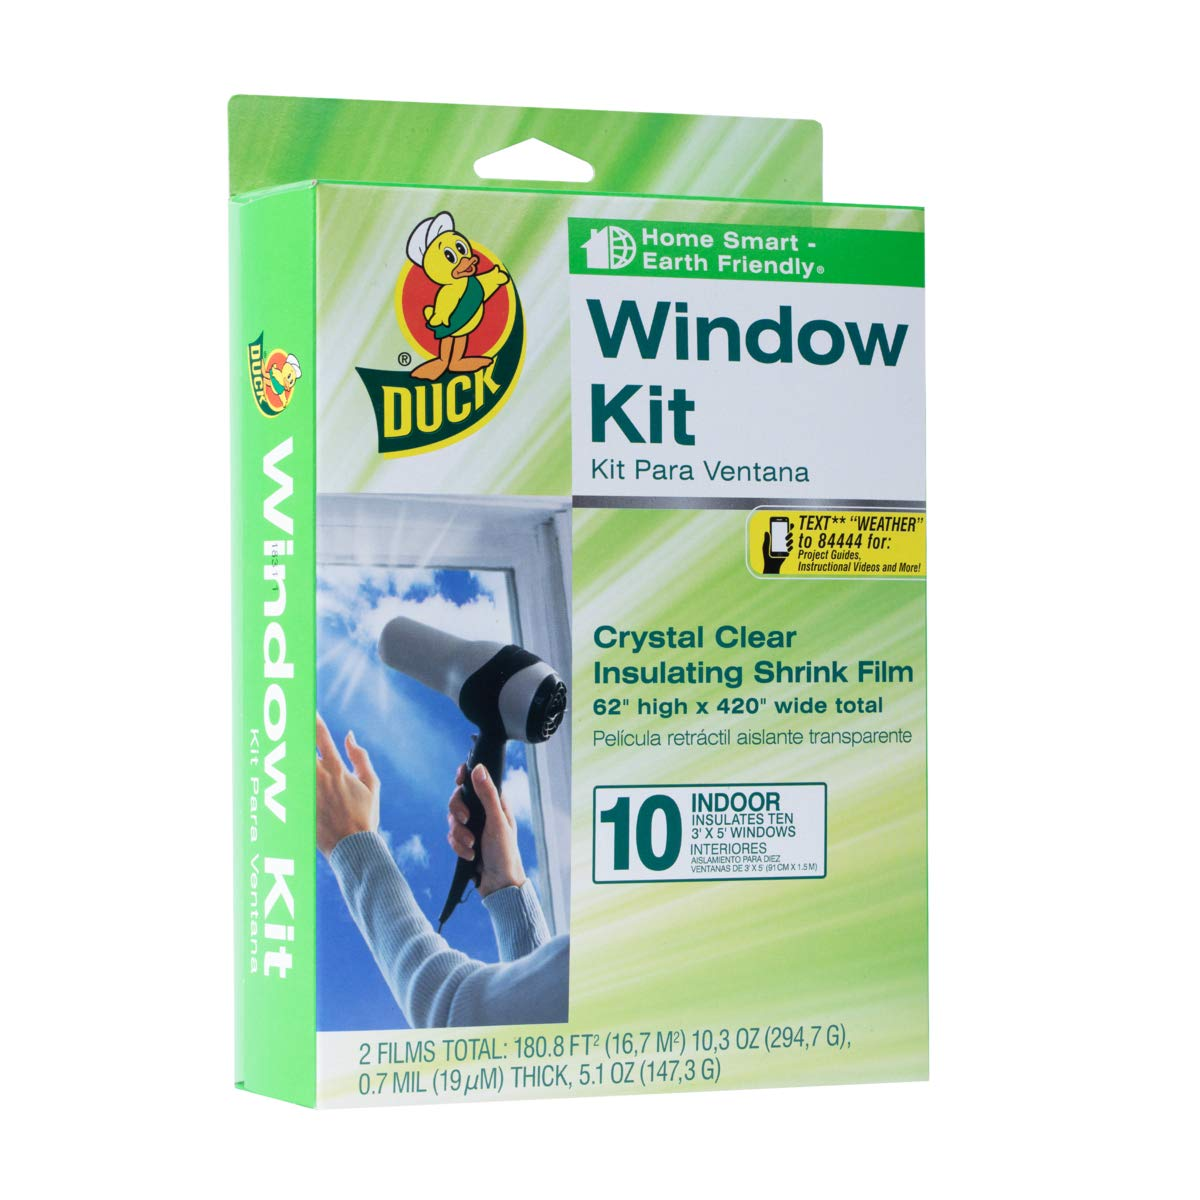 Duck Brand Indoor 10-Window Shrink Film Insulator Kit, 62-Inch x 420-Inch, 286216 by Duck